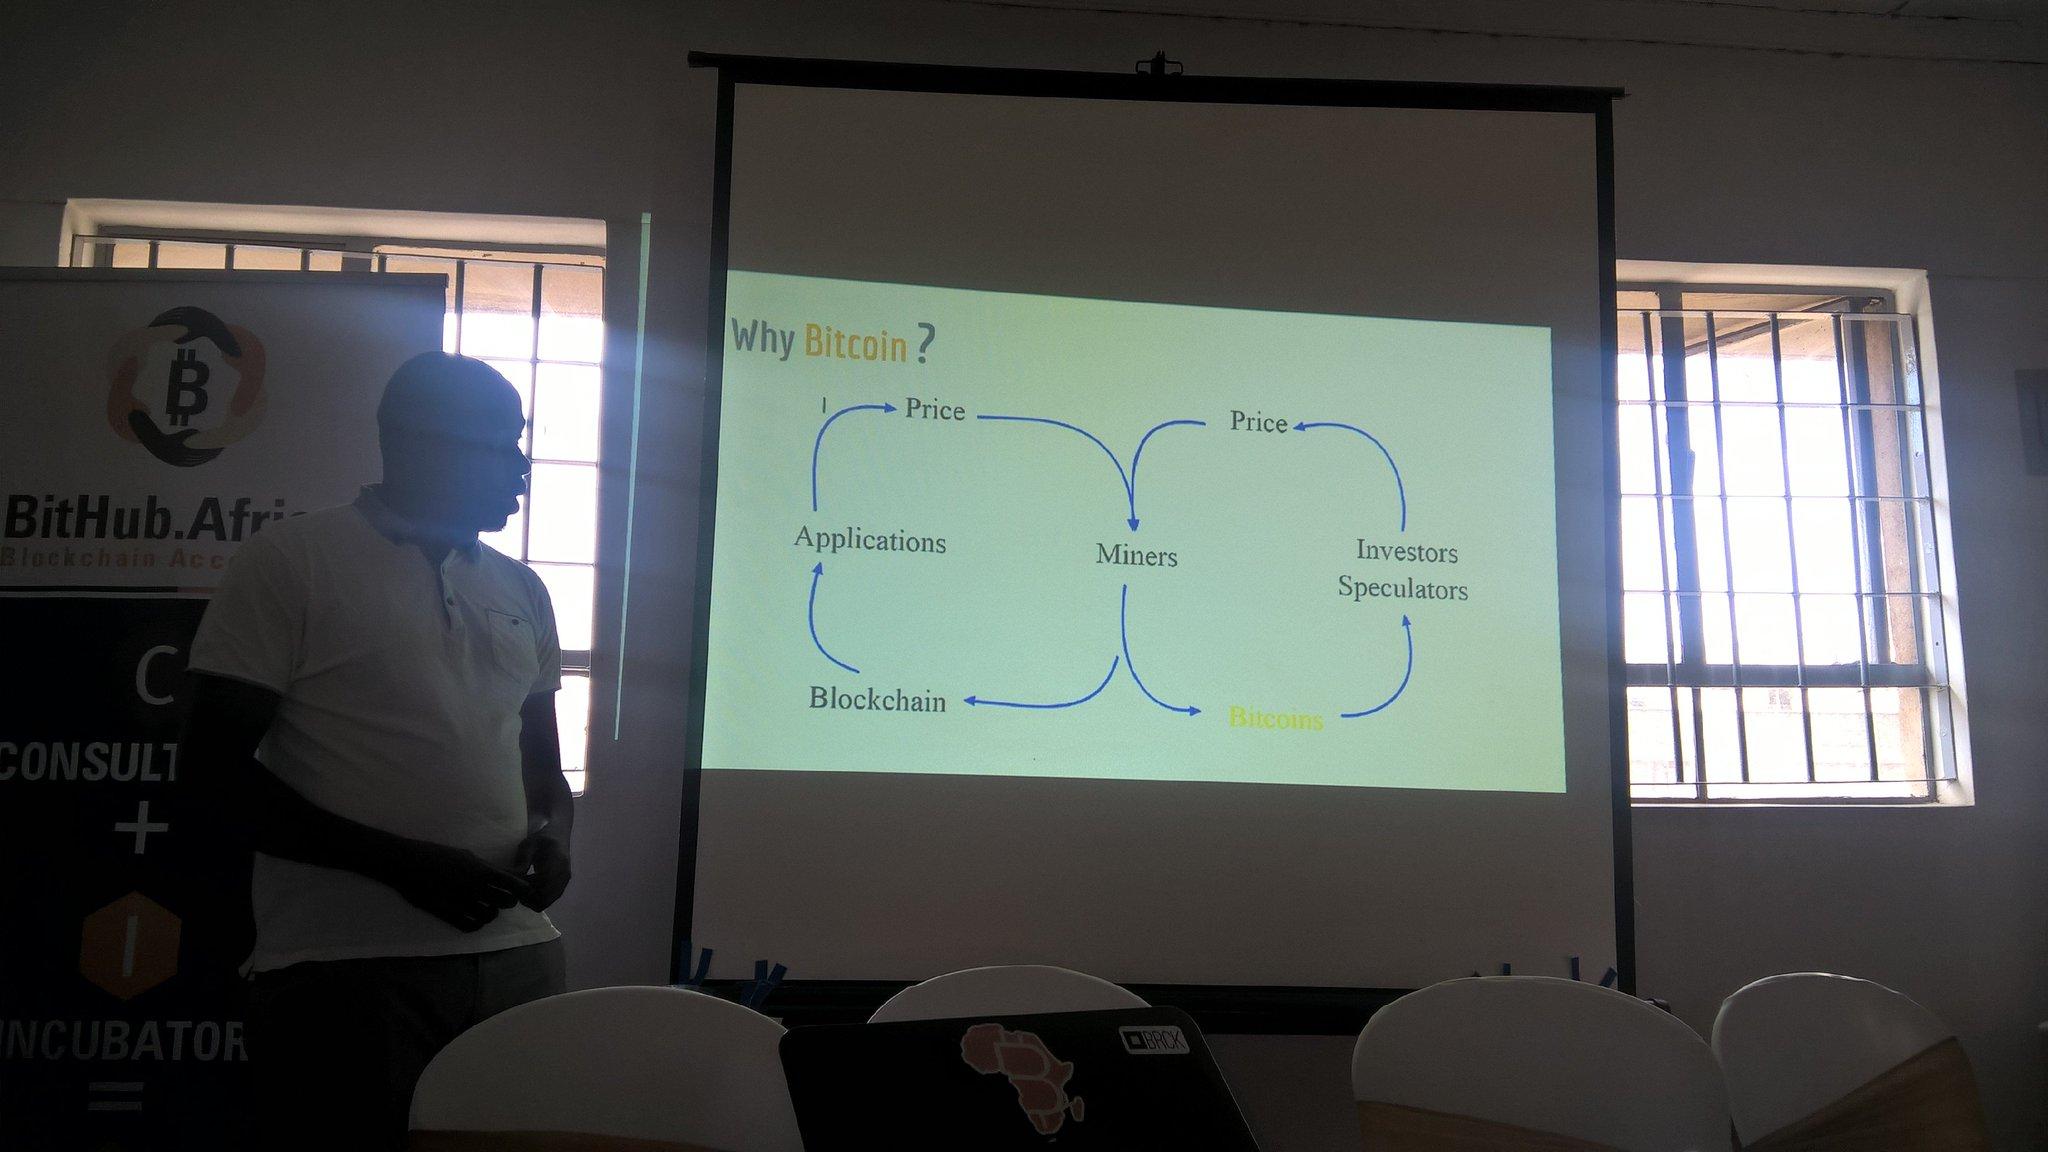 How to trade on bitcoin @BitHubAfrica  #NyamaNaBitcoin #Bitcoin #Nairobi https://t.co/uUtNbaDyUb